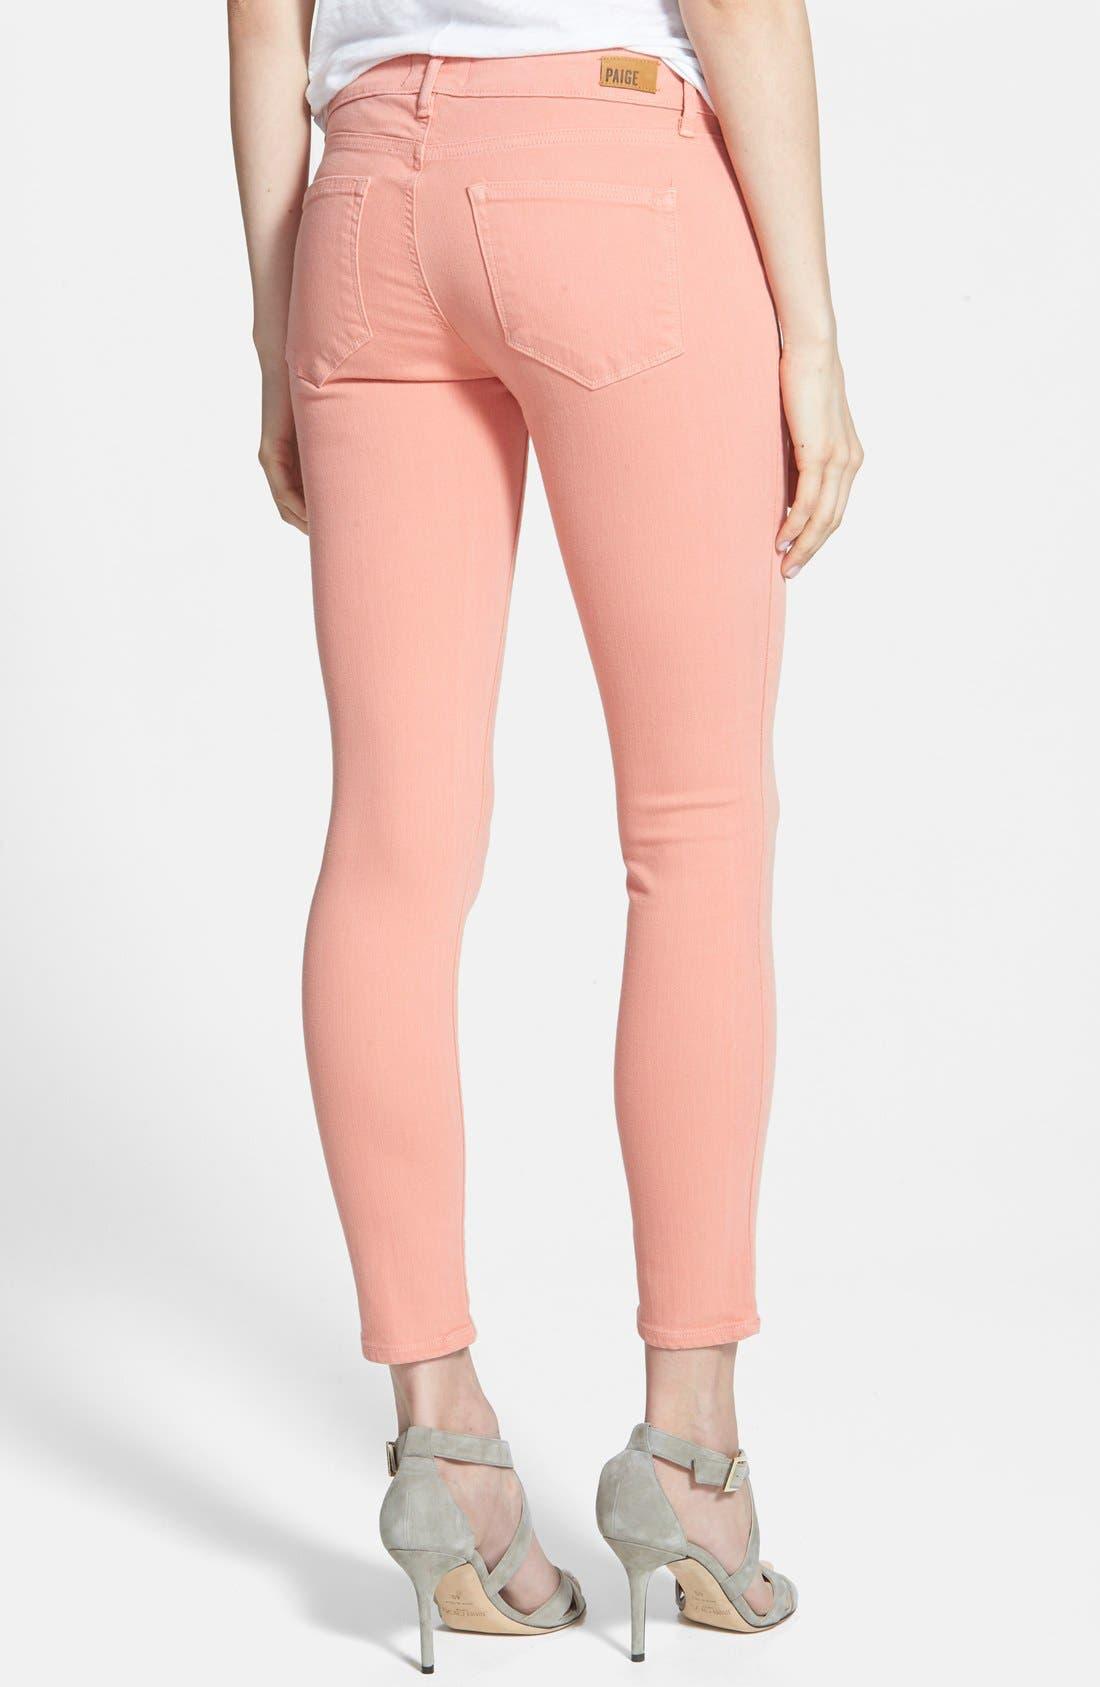 Alternate Image 2  - Paige Denim 'Verdugo' Ankle Super Skinny Jeans (Desert Sunset)